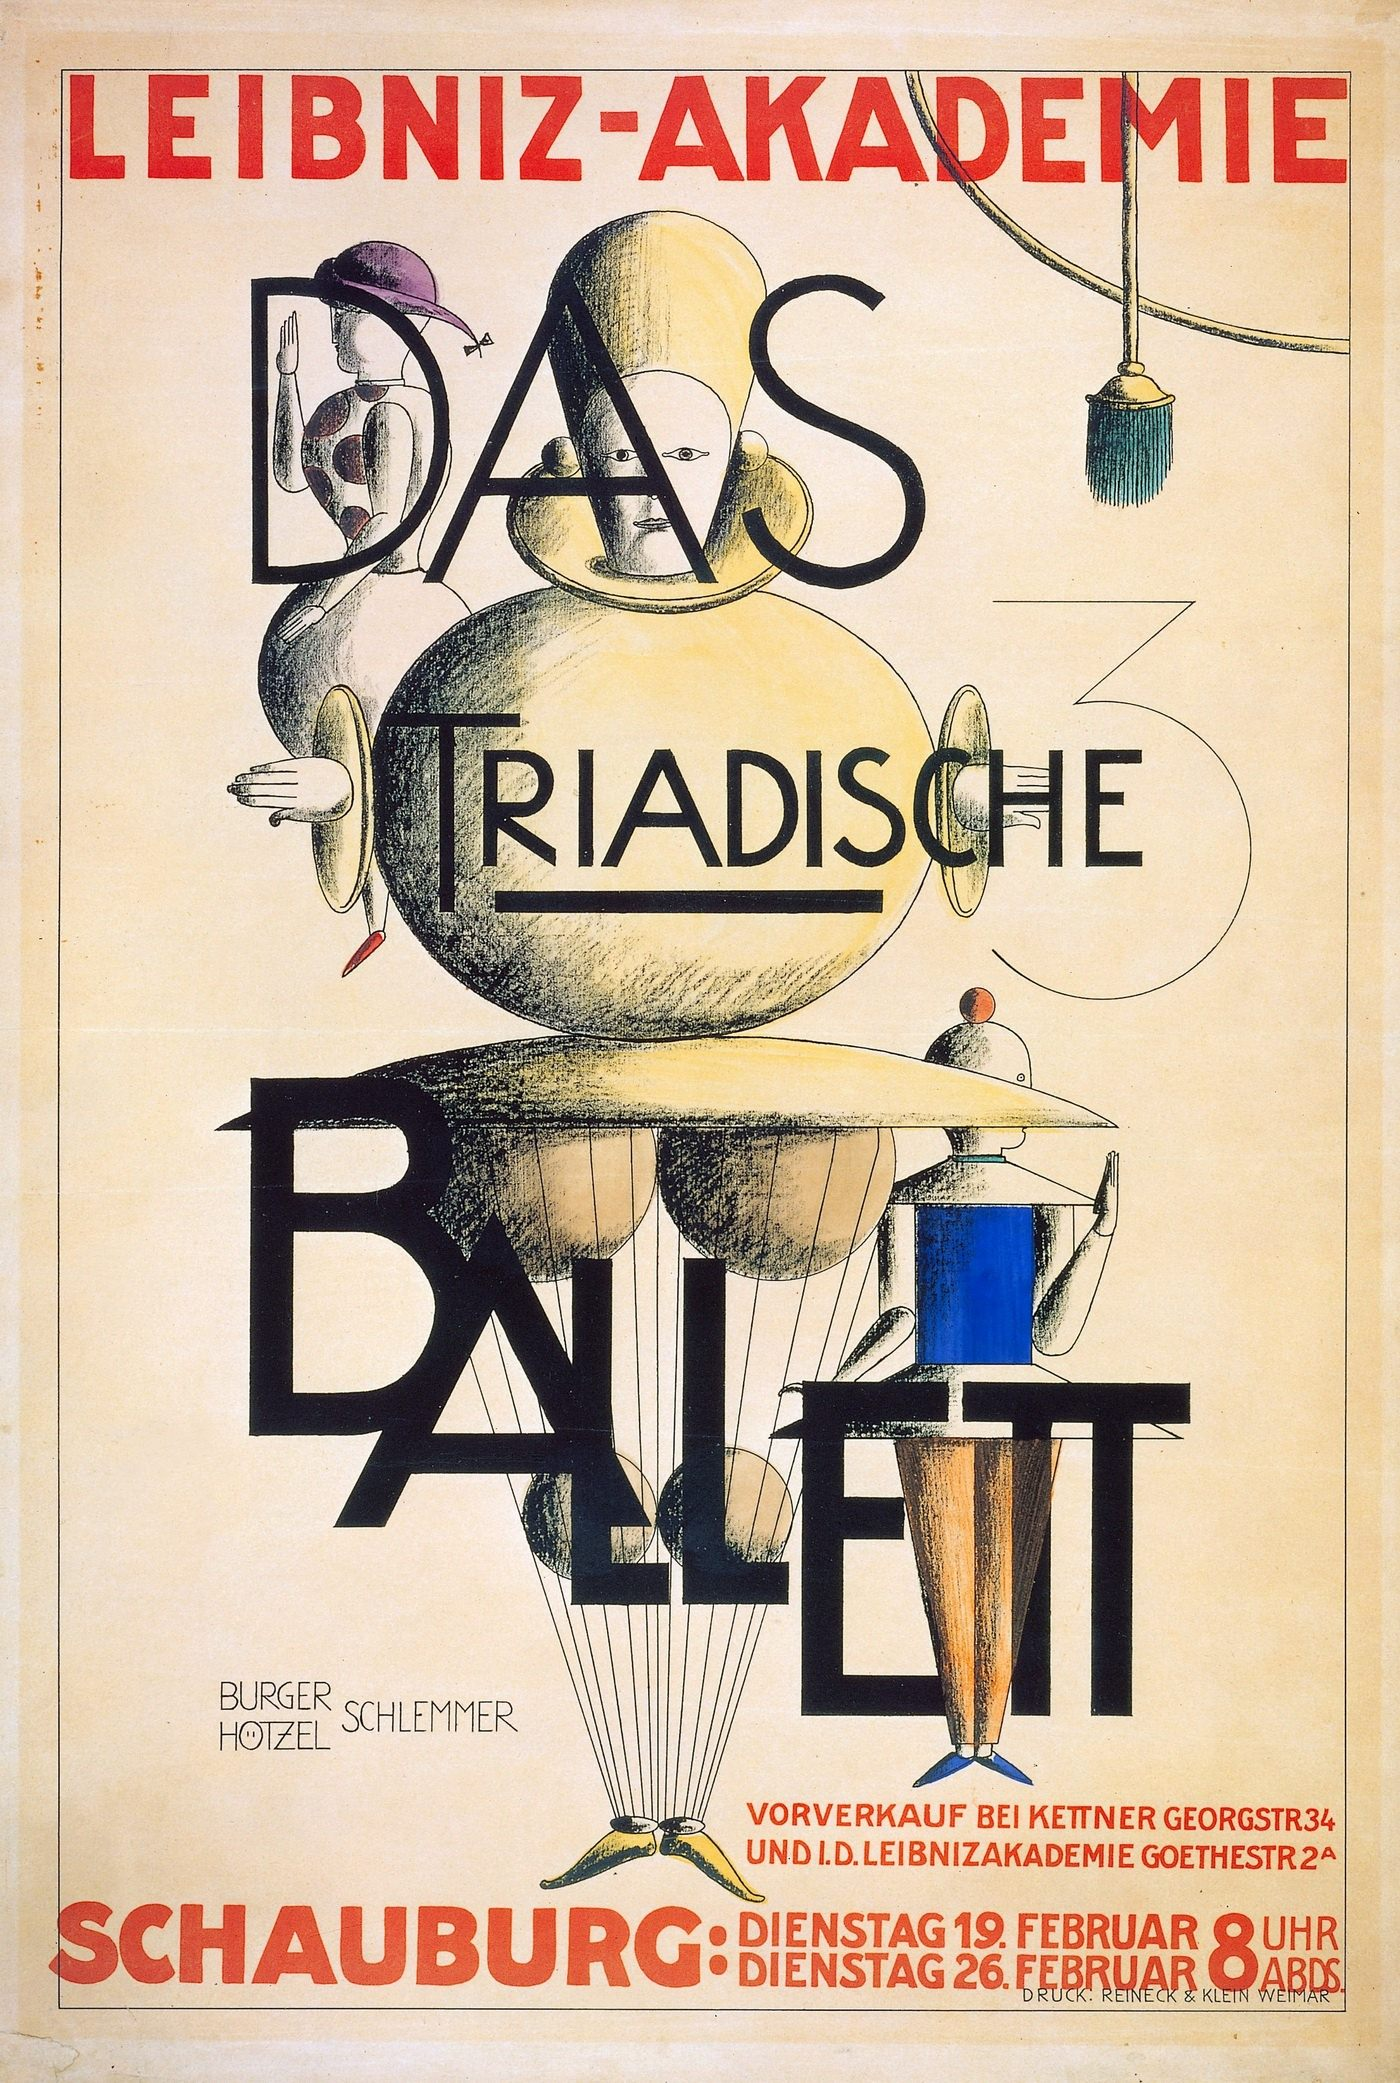 О. Шлеммер. Триадический балет. Плакат, 1924